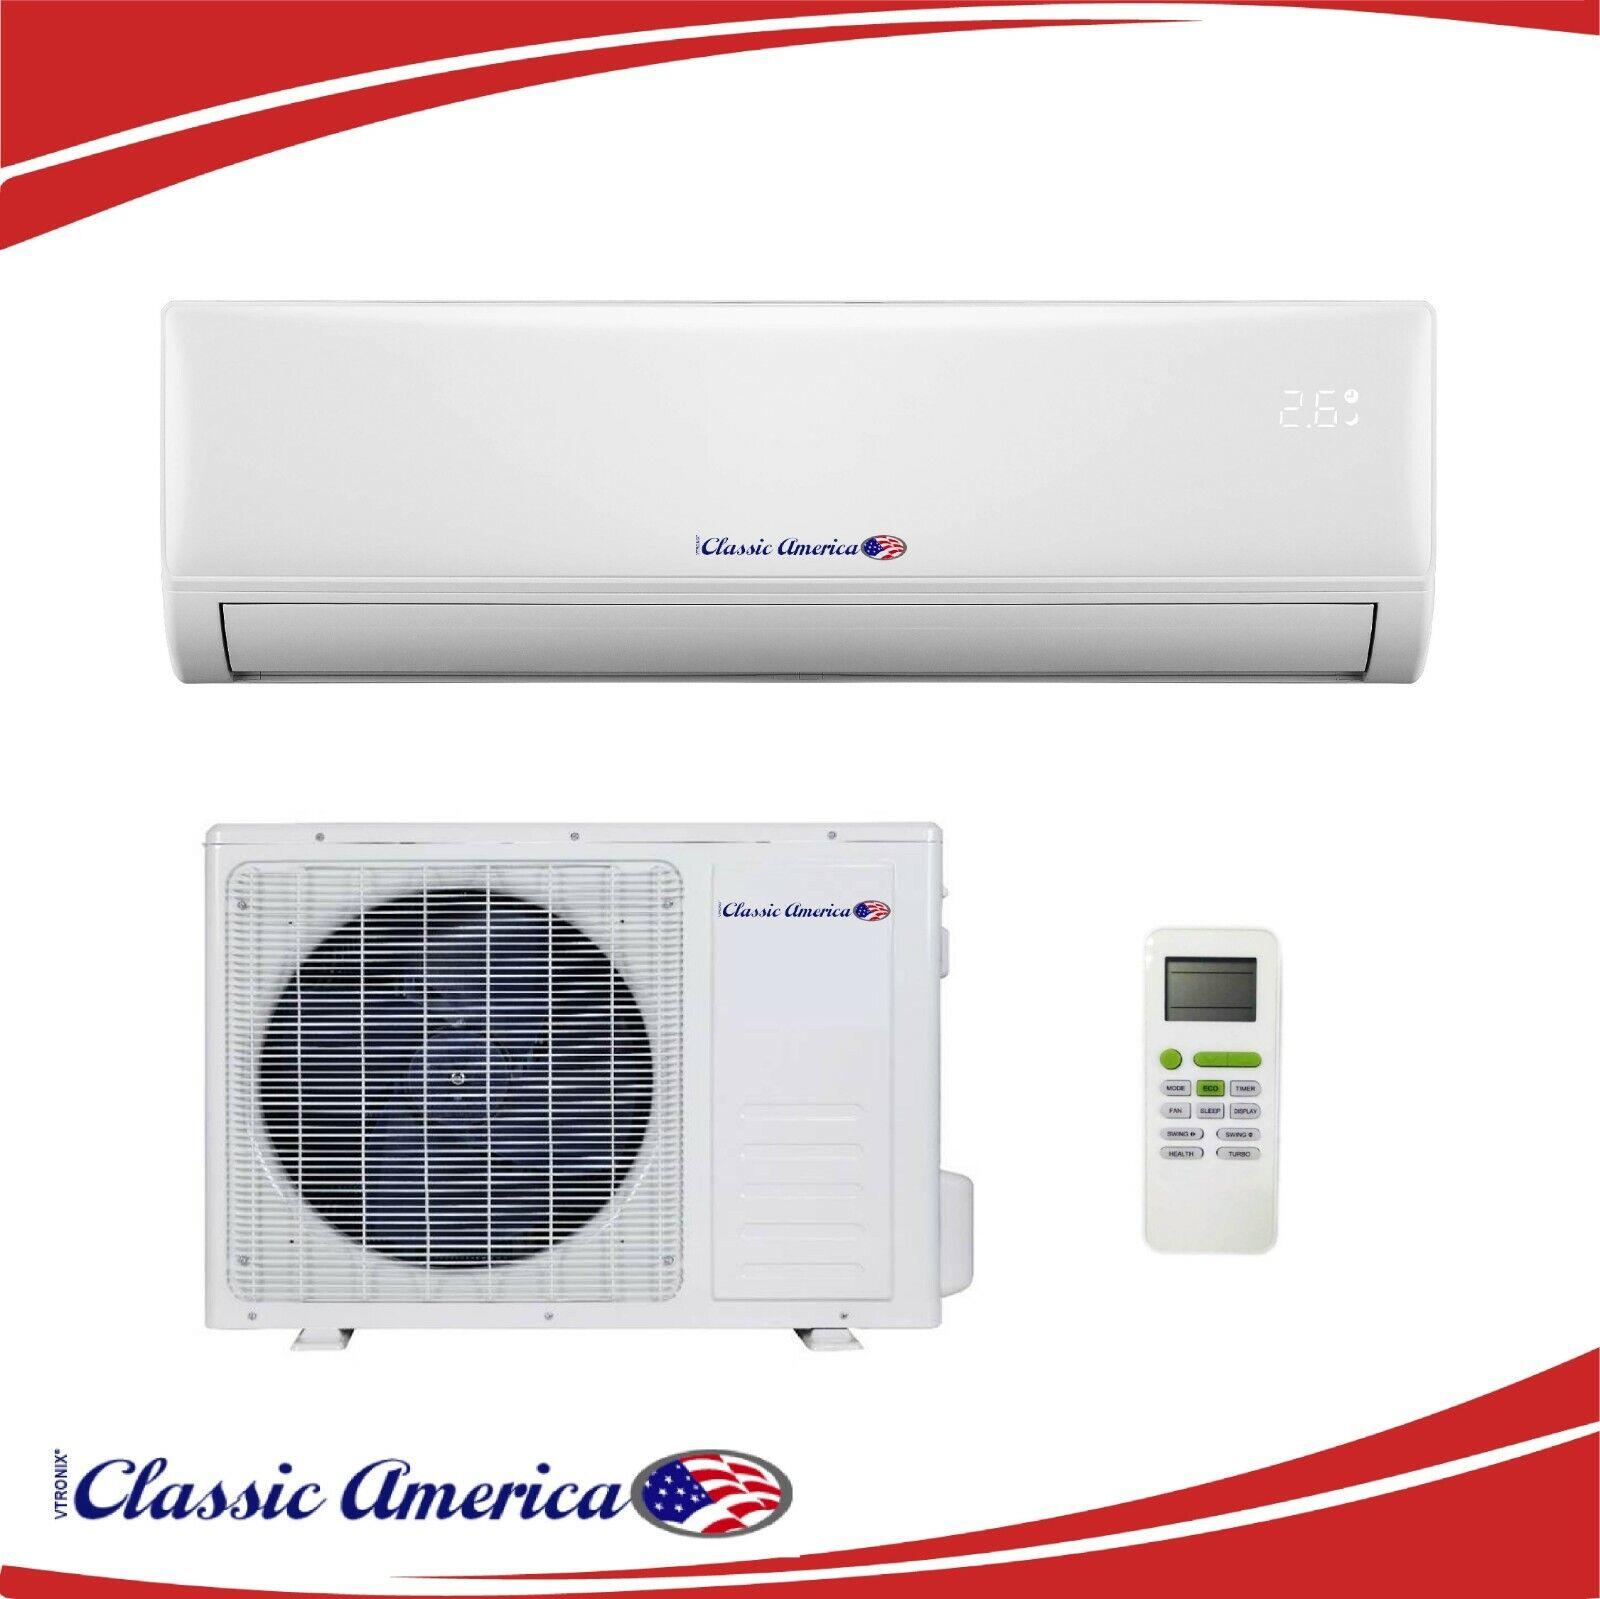 Classic America 24000 BTU Inverter Air Conditioner Heat Pump